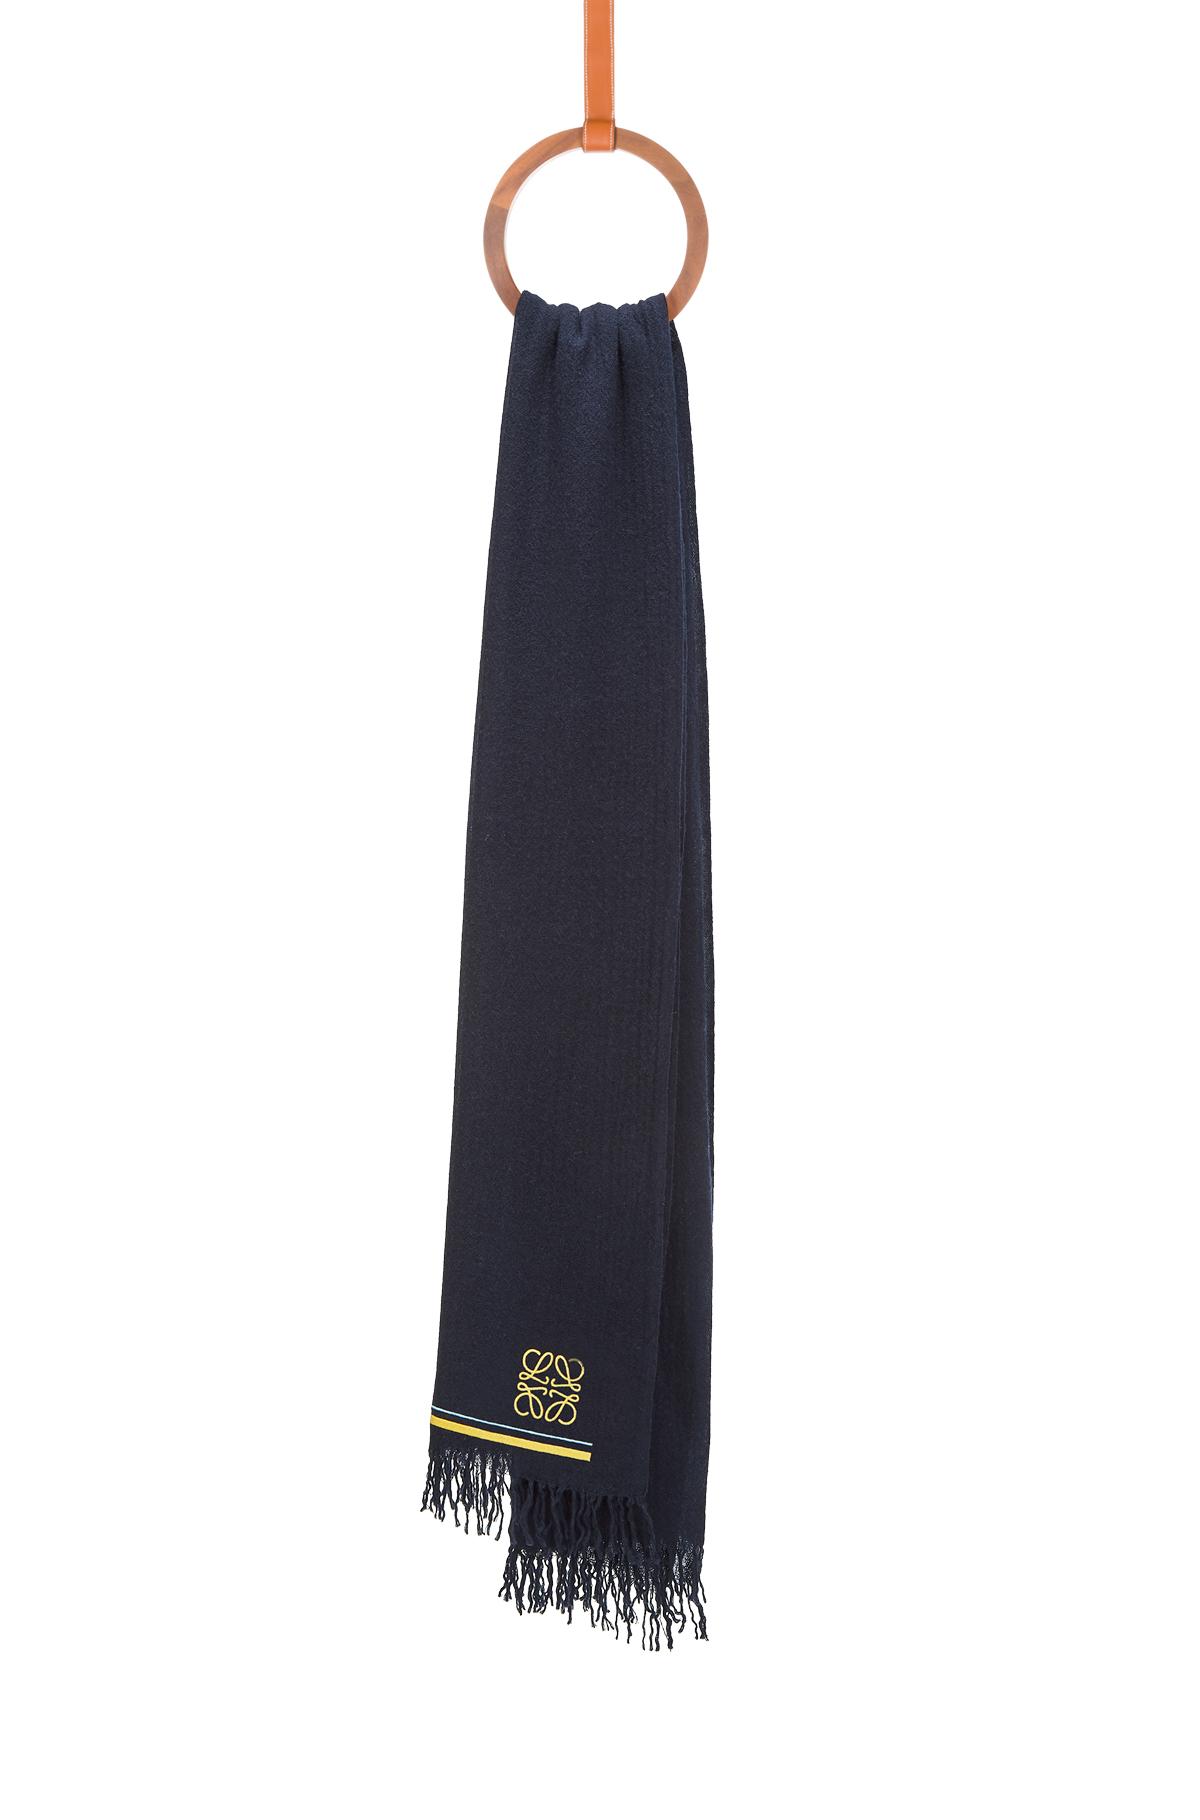 LOEWE 65X200 スカーフアナグラムストライプ ネイビーブルー front